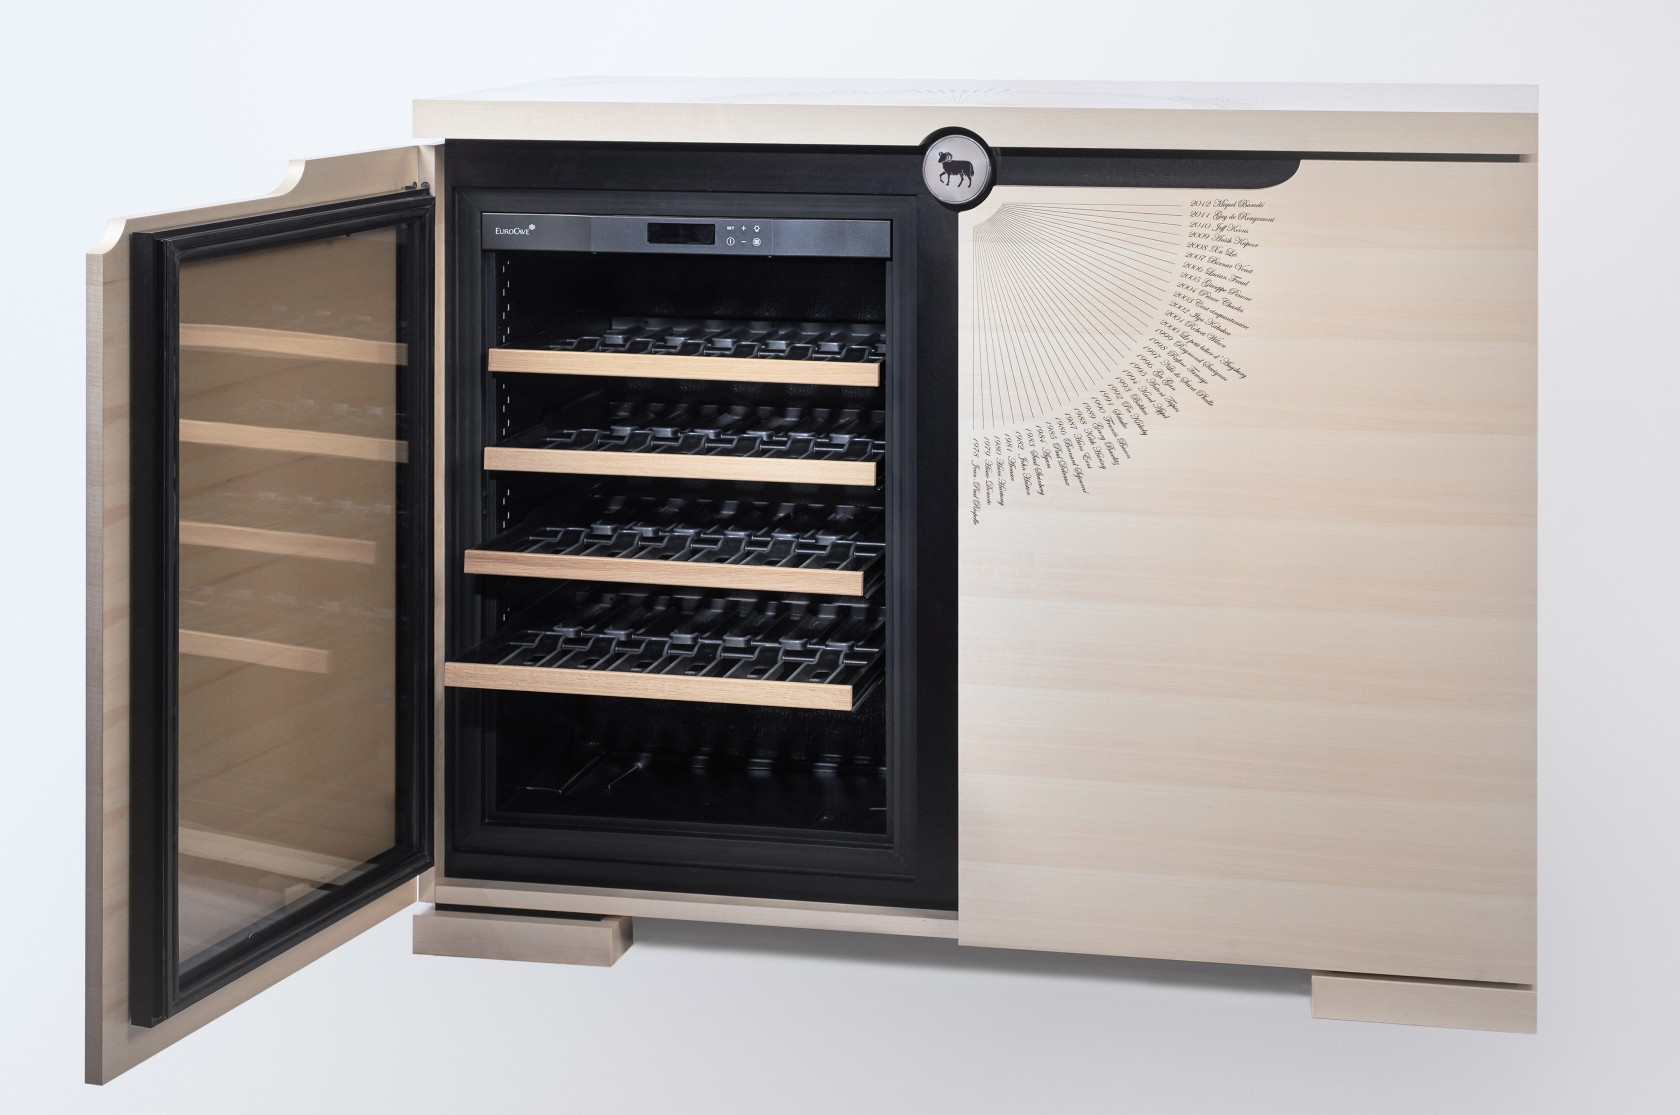 cave vin ludovic avenel b niste cr ateur paris. Black Bedroom Furniture Sets. Home Design Ideas